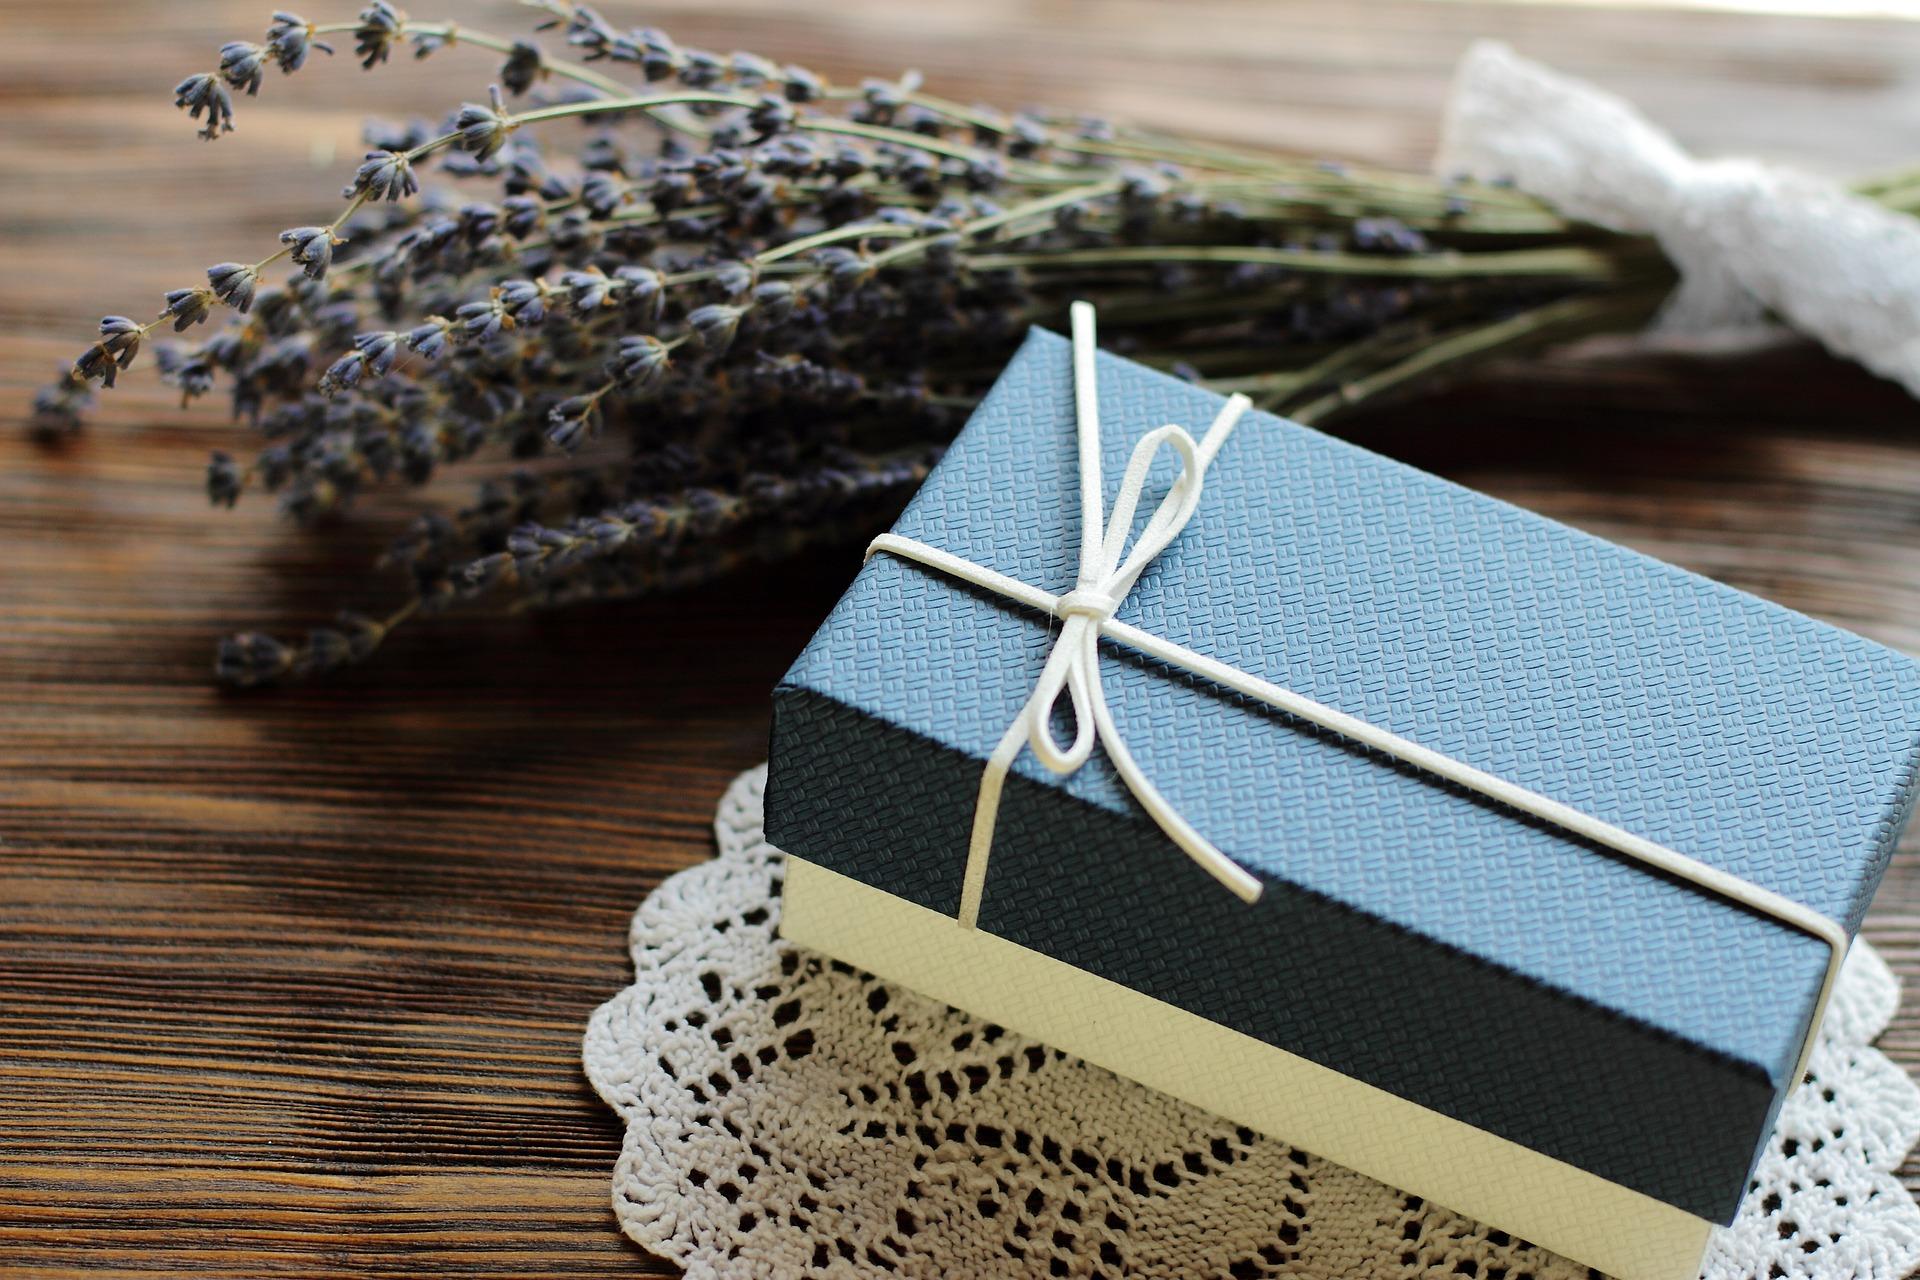 Most romantic gift ideas